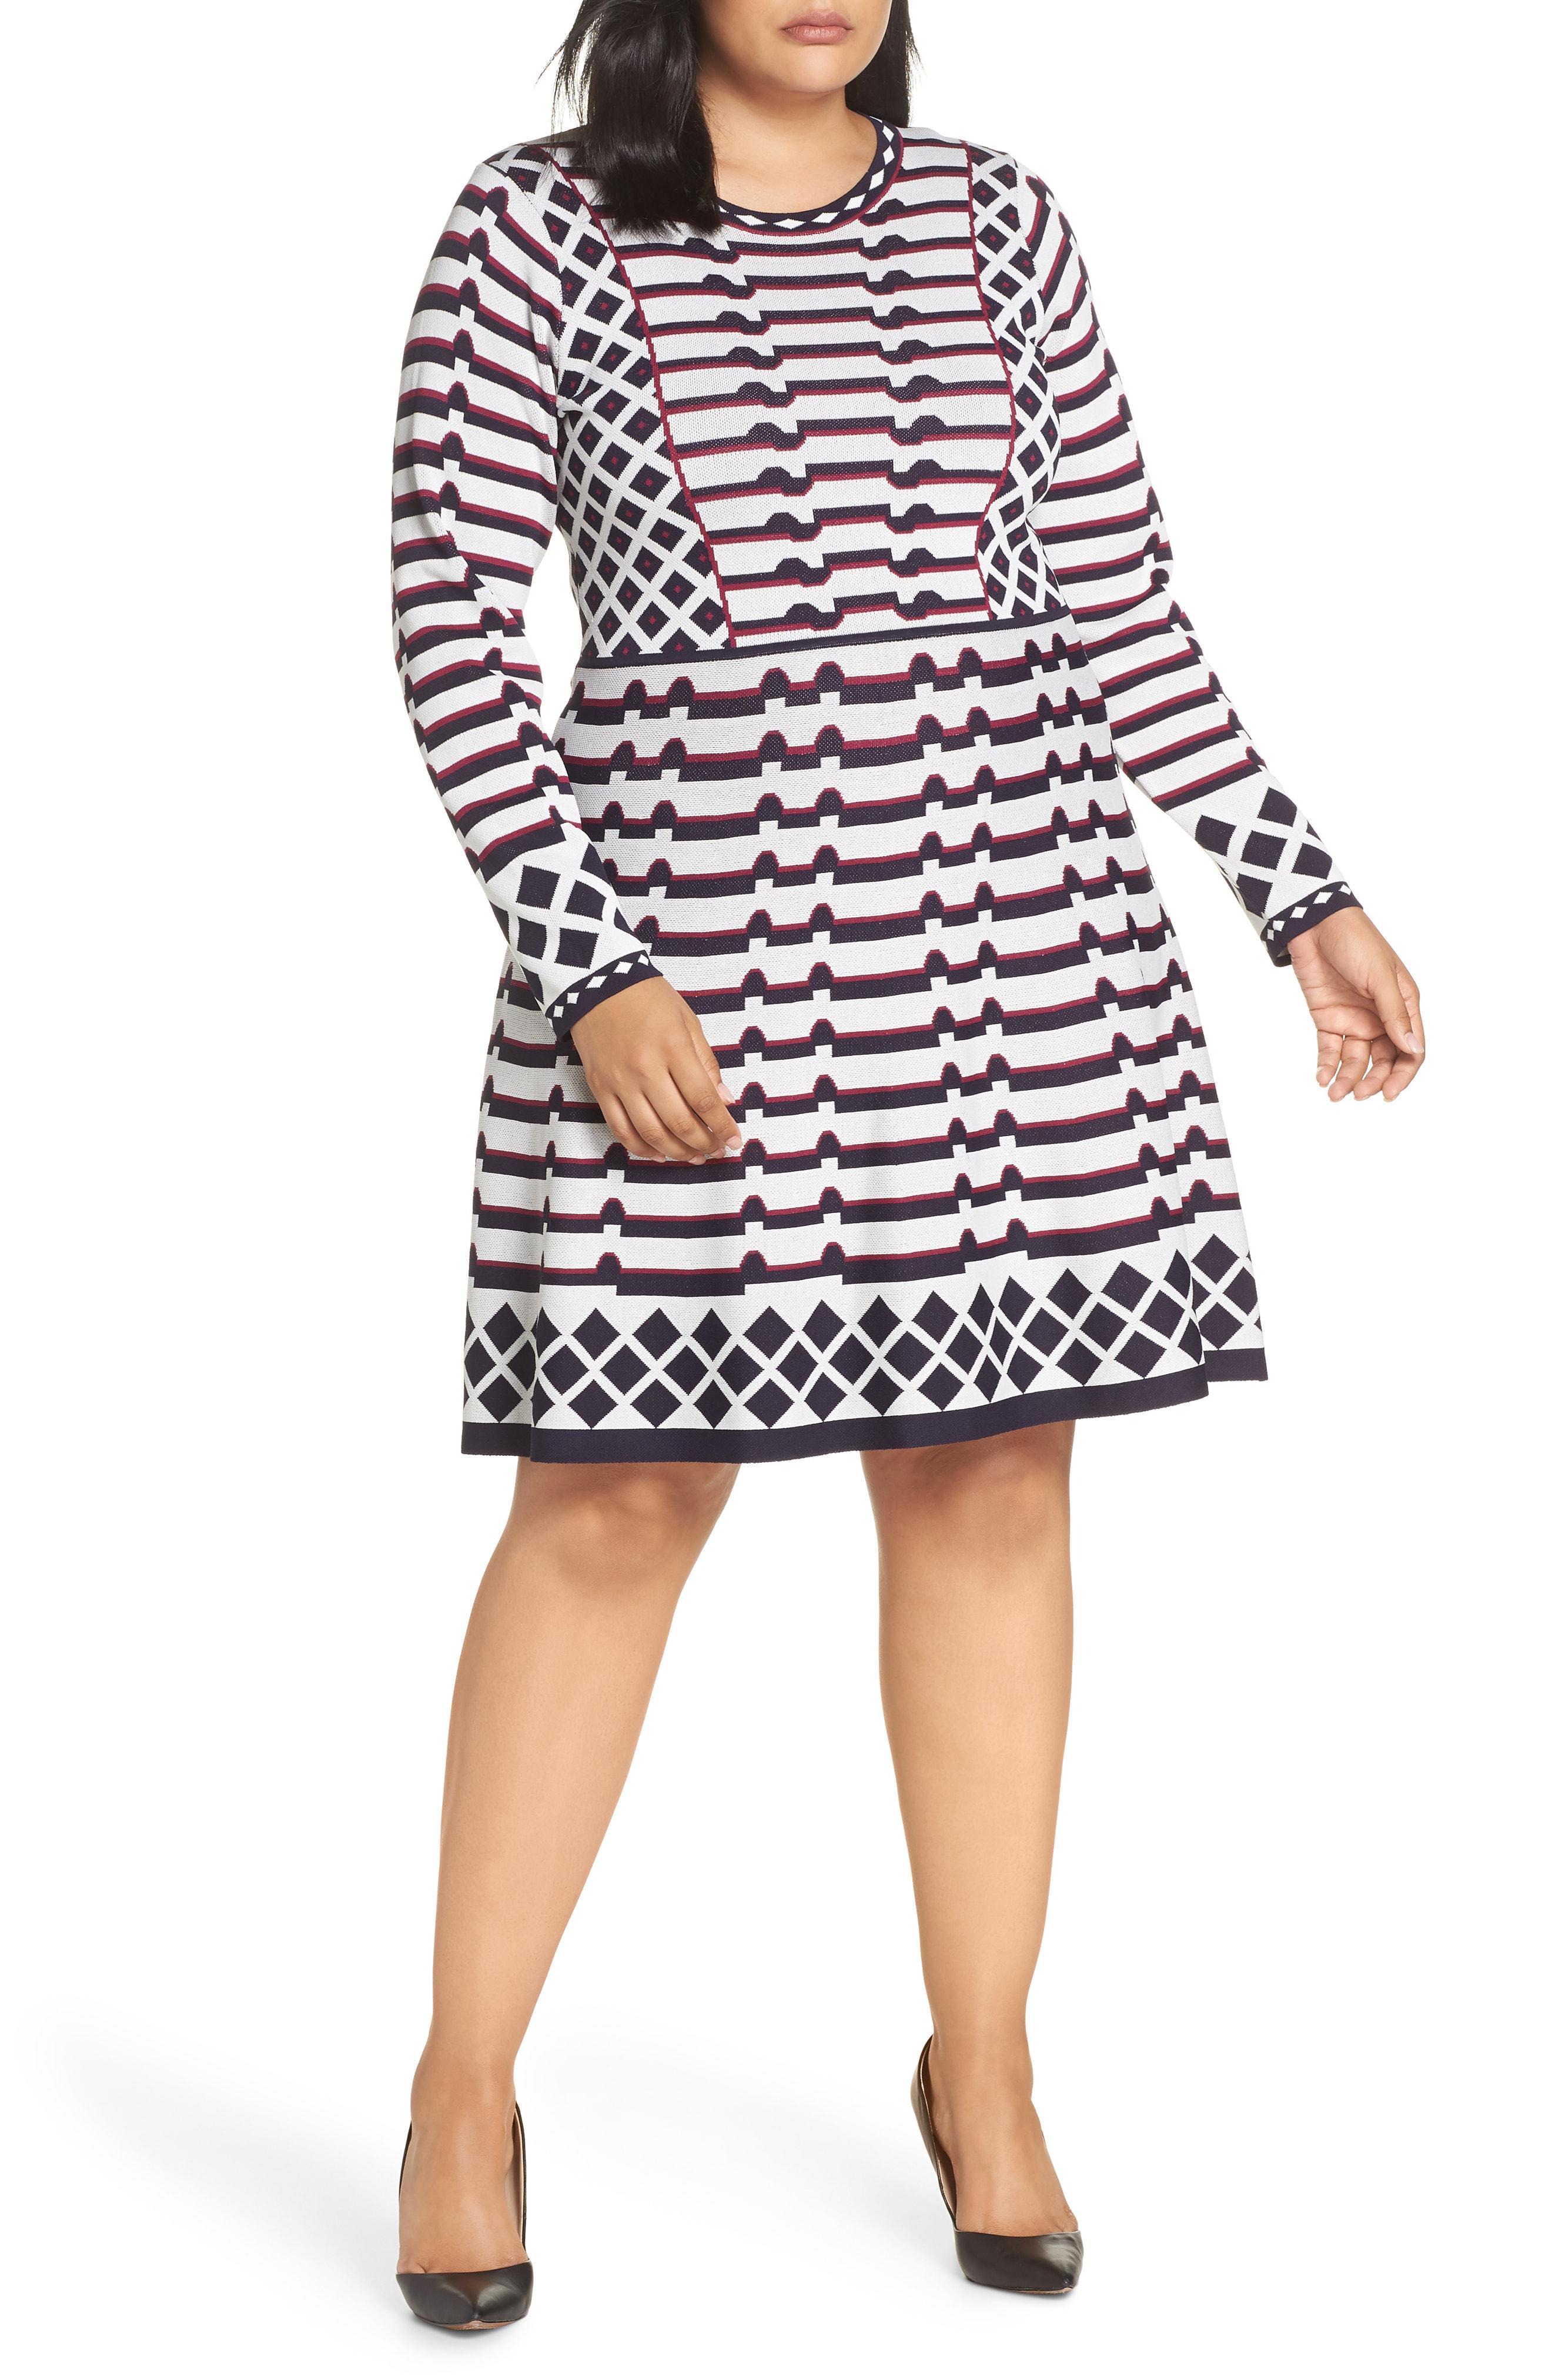 90c4765d5ce Lyst - Eliza J Artwork Jacquard Sweater Dress in Black